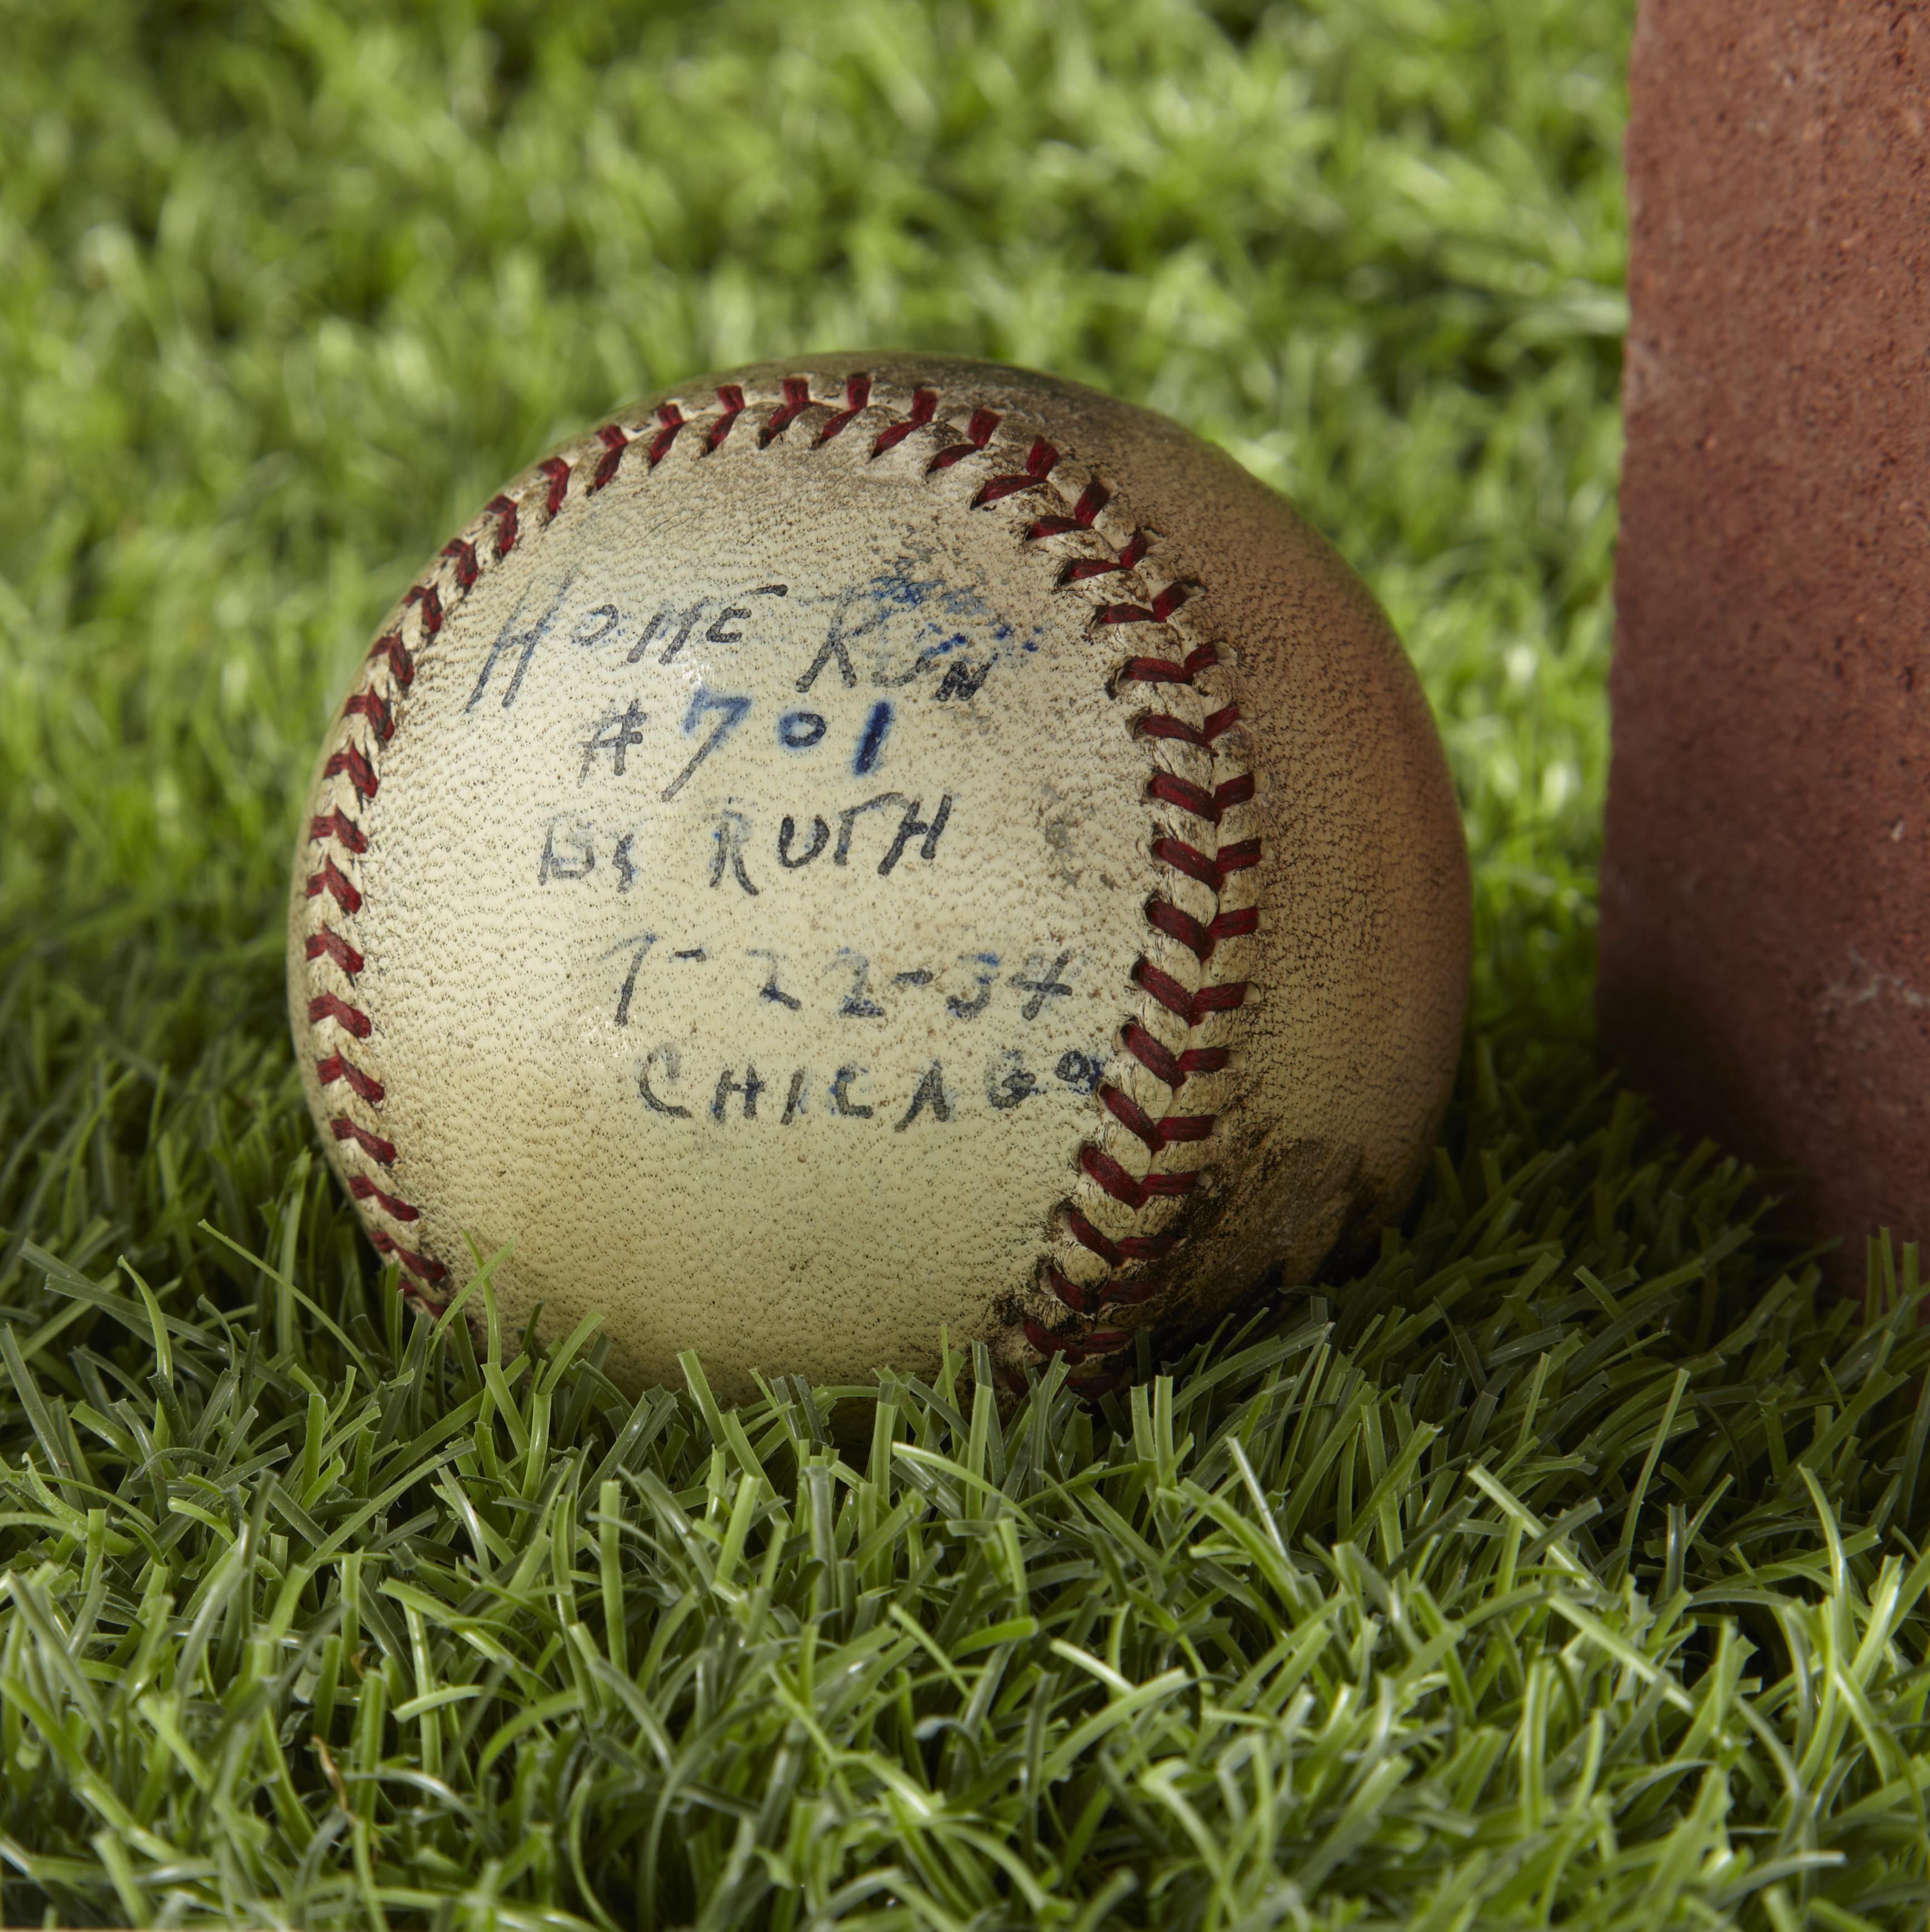 Ruth_baseball_HR107